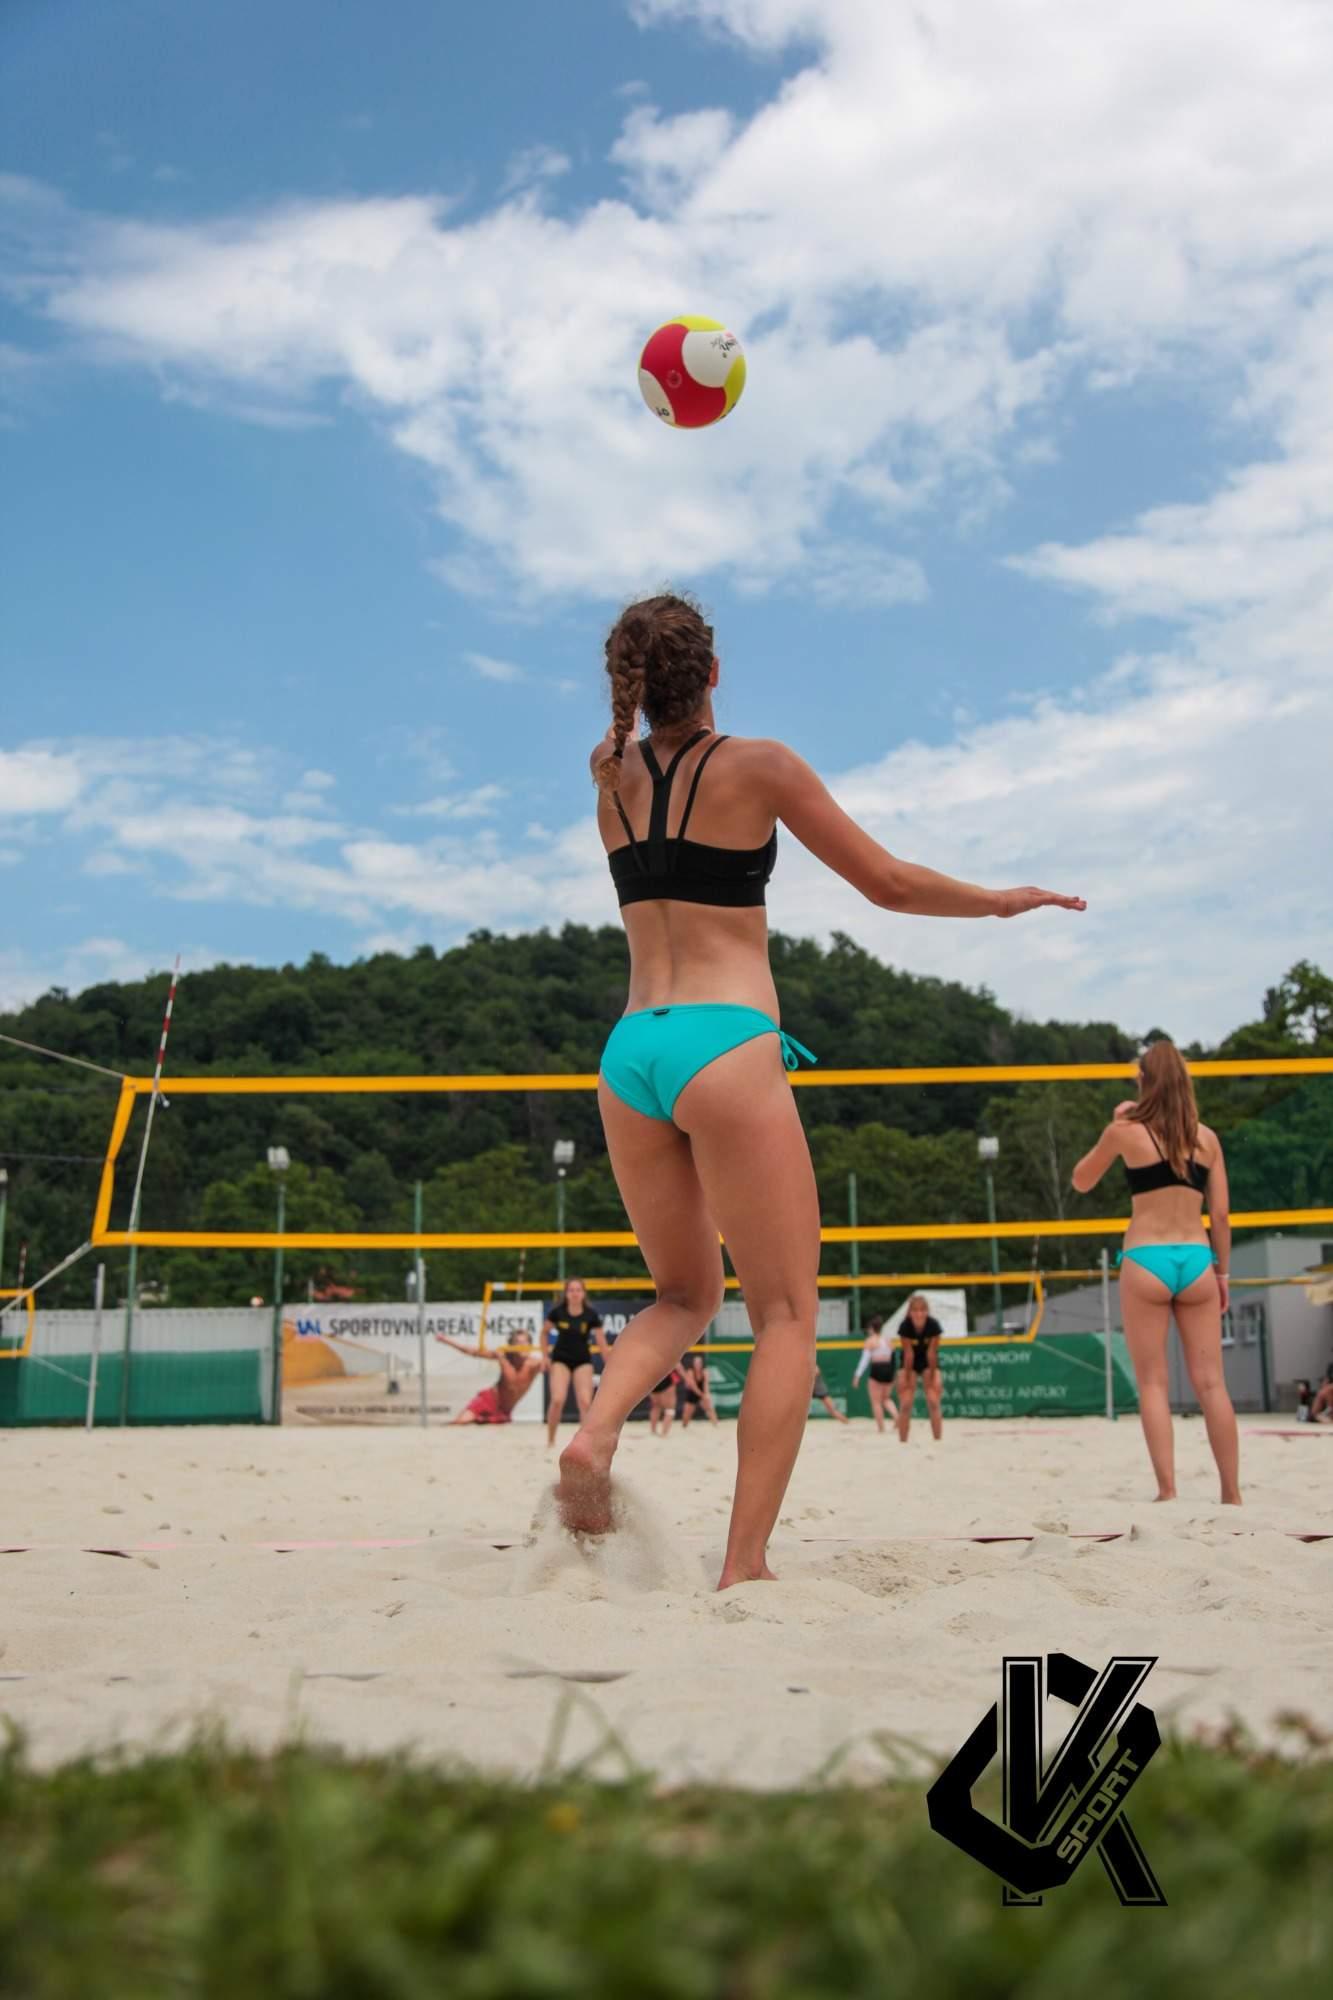 rajce.idnes. beach 2 rajce.idnes. Chorvatsko naked)